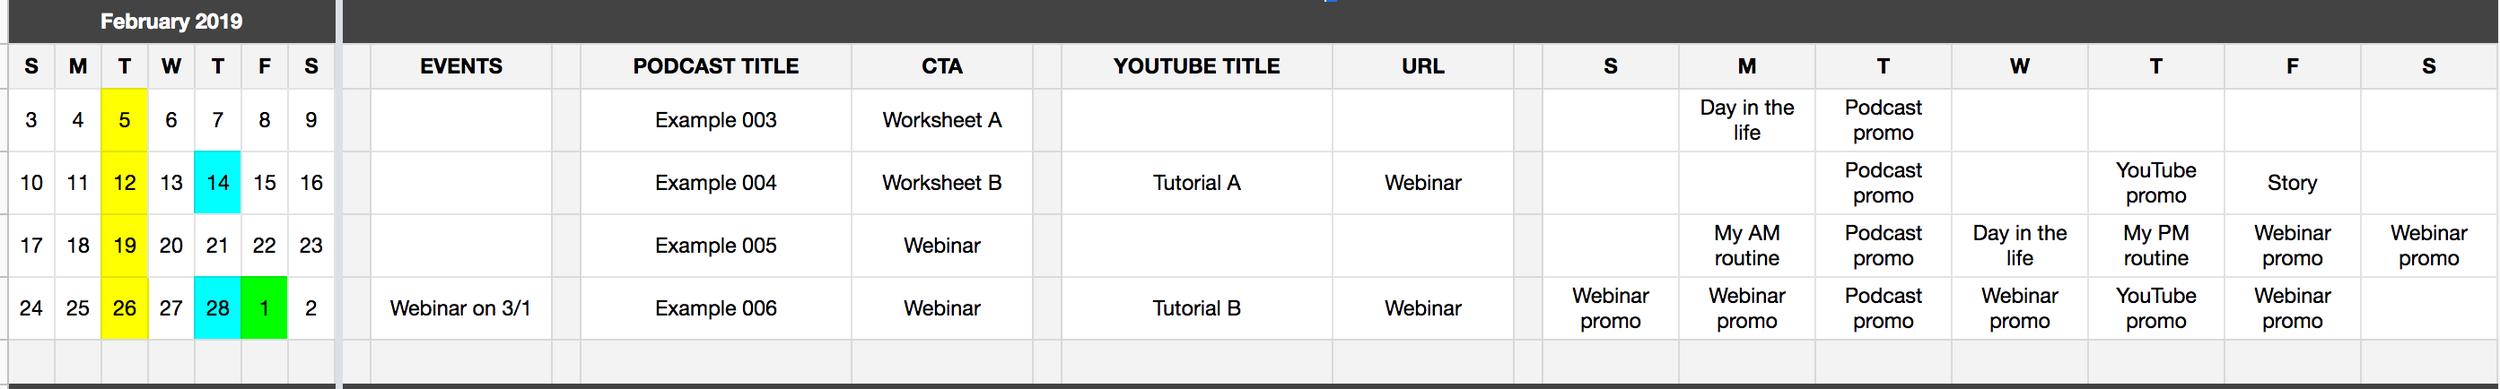 How to create a content calendar using Google Sheets - Megan Minns